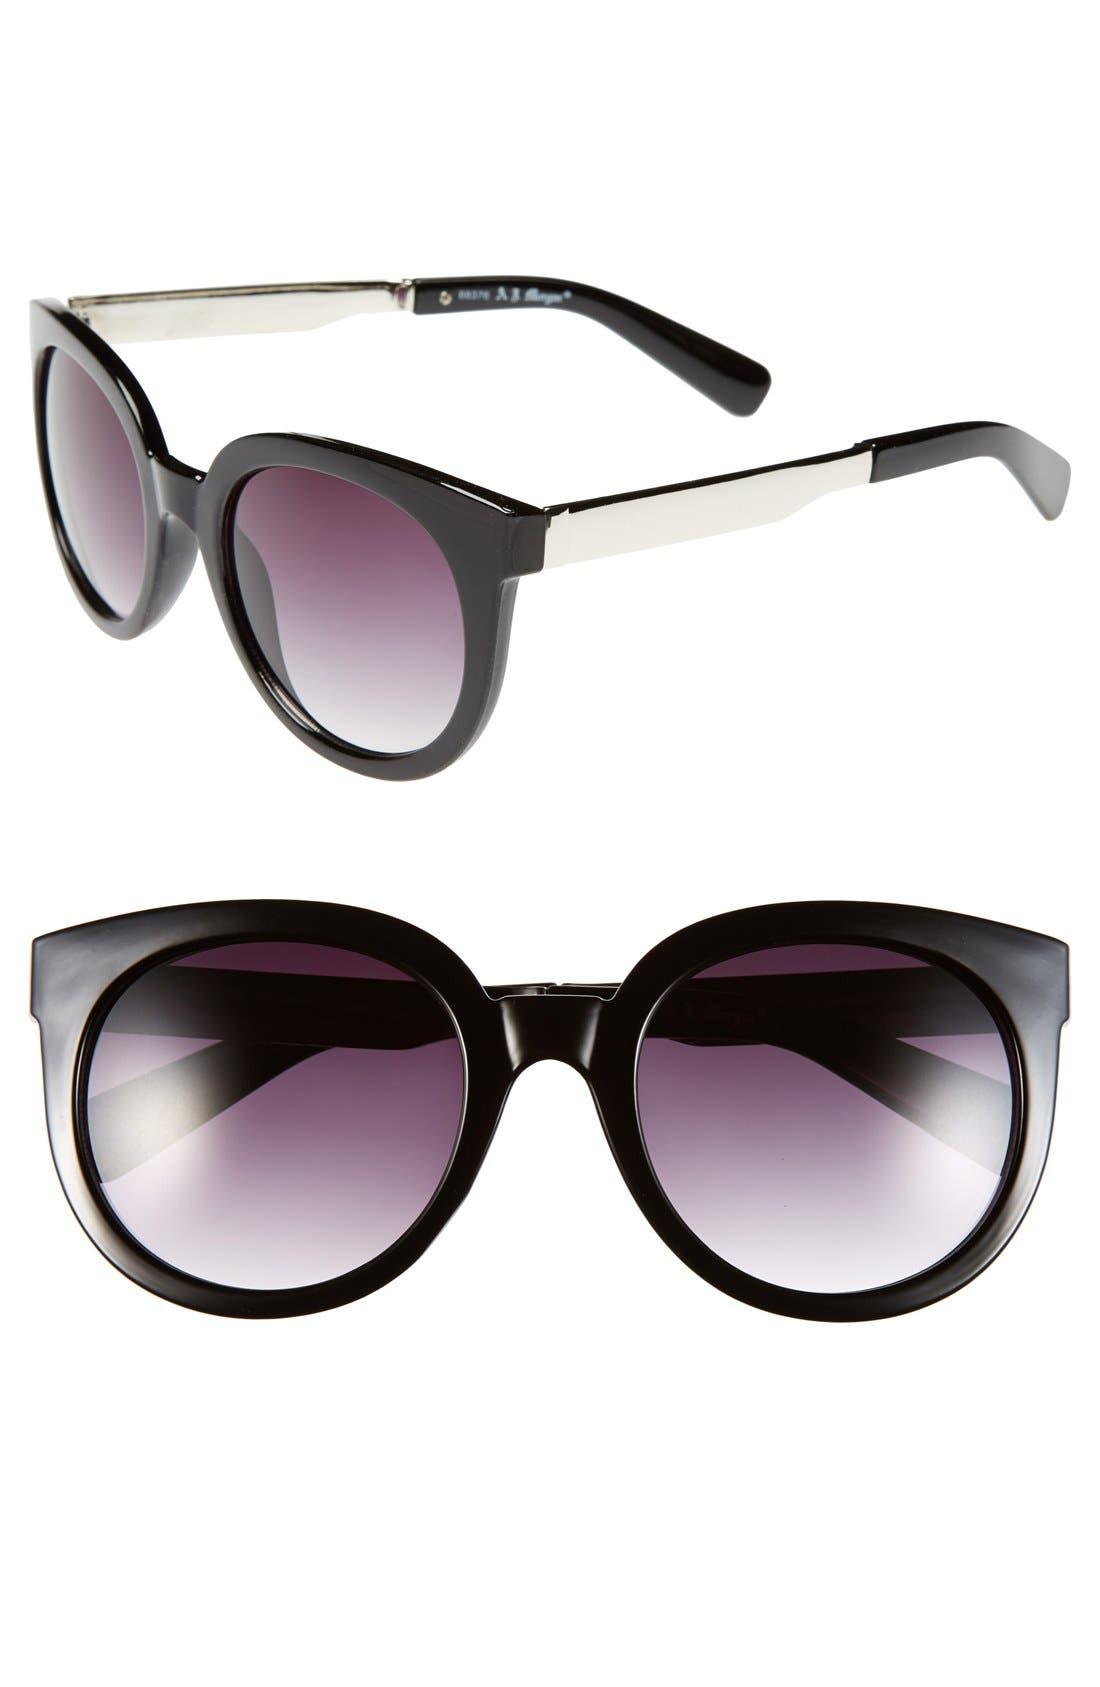 Alternate Image 1 Selected - A.J. Morgan 'Classy' 50mm Retro Sunglasses